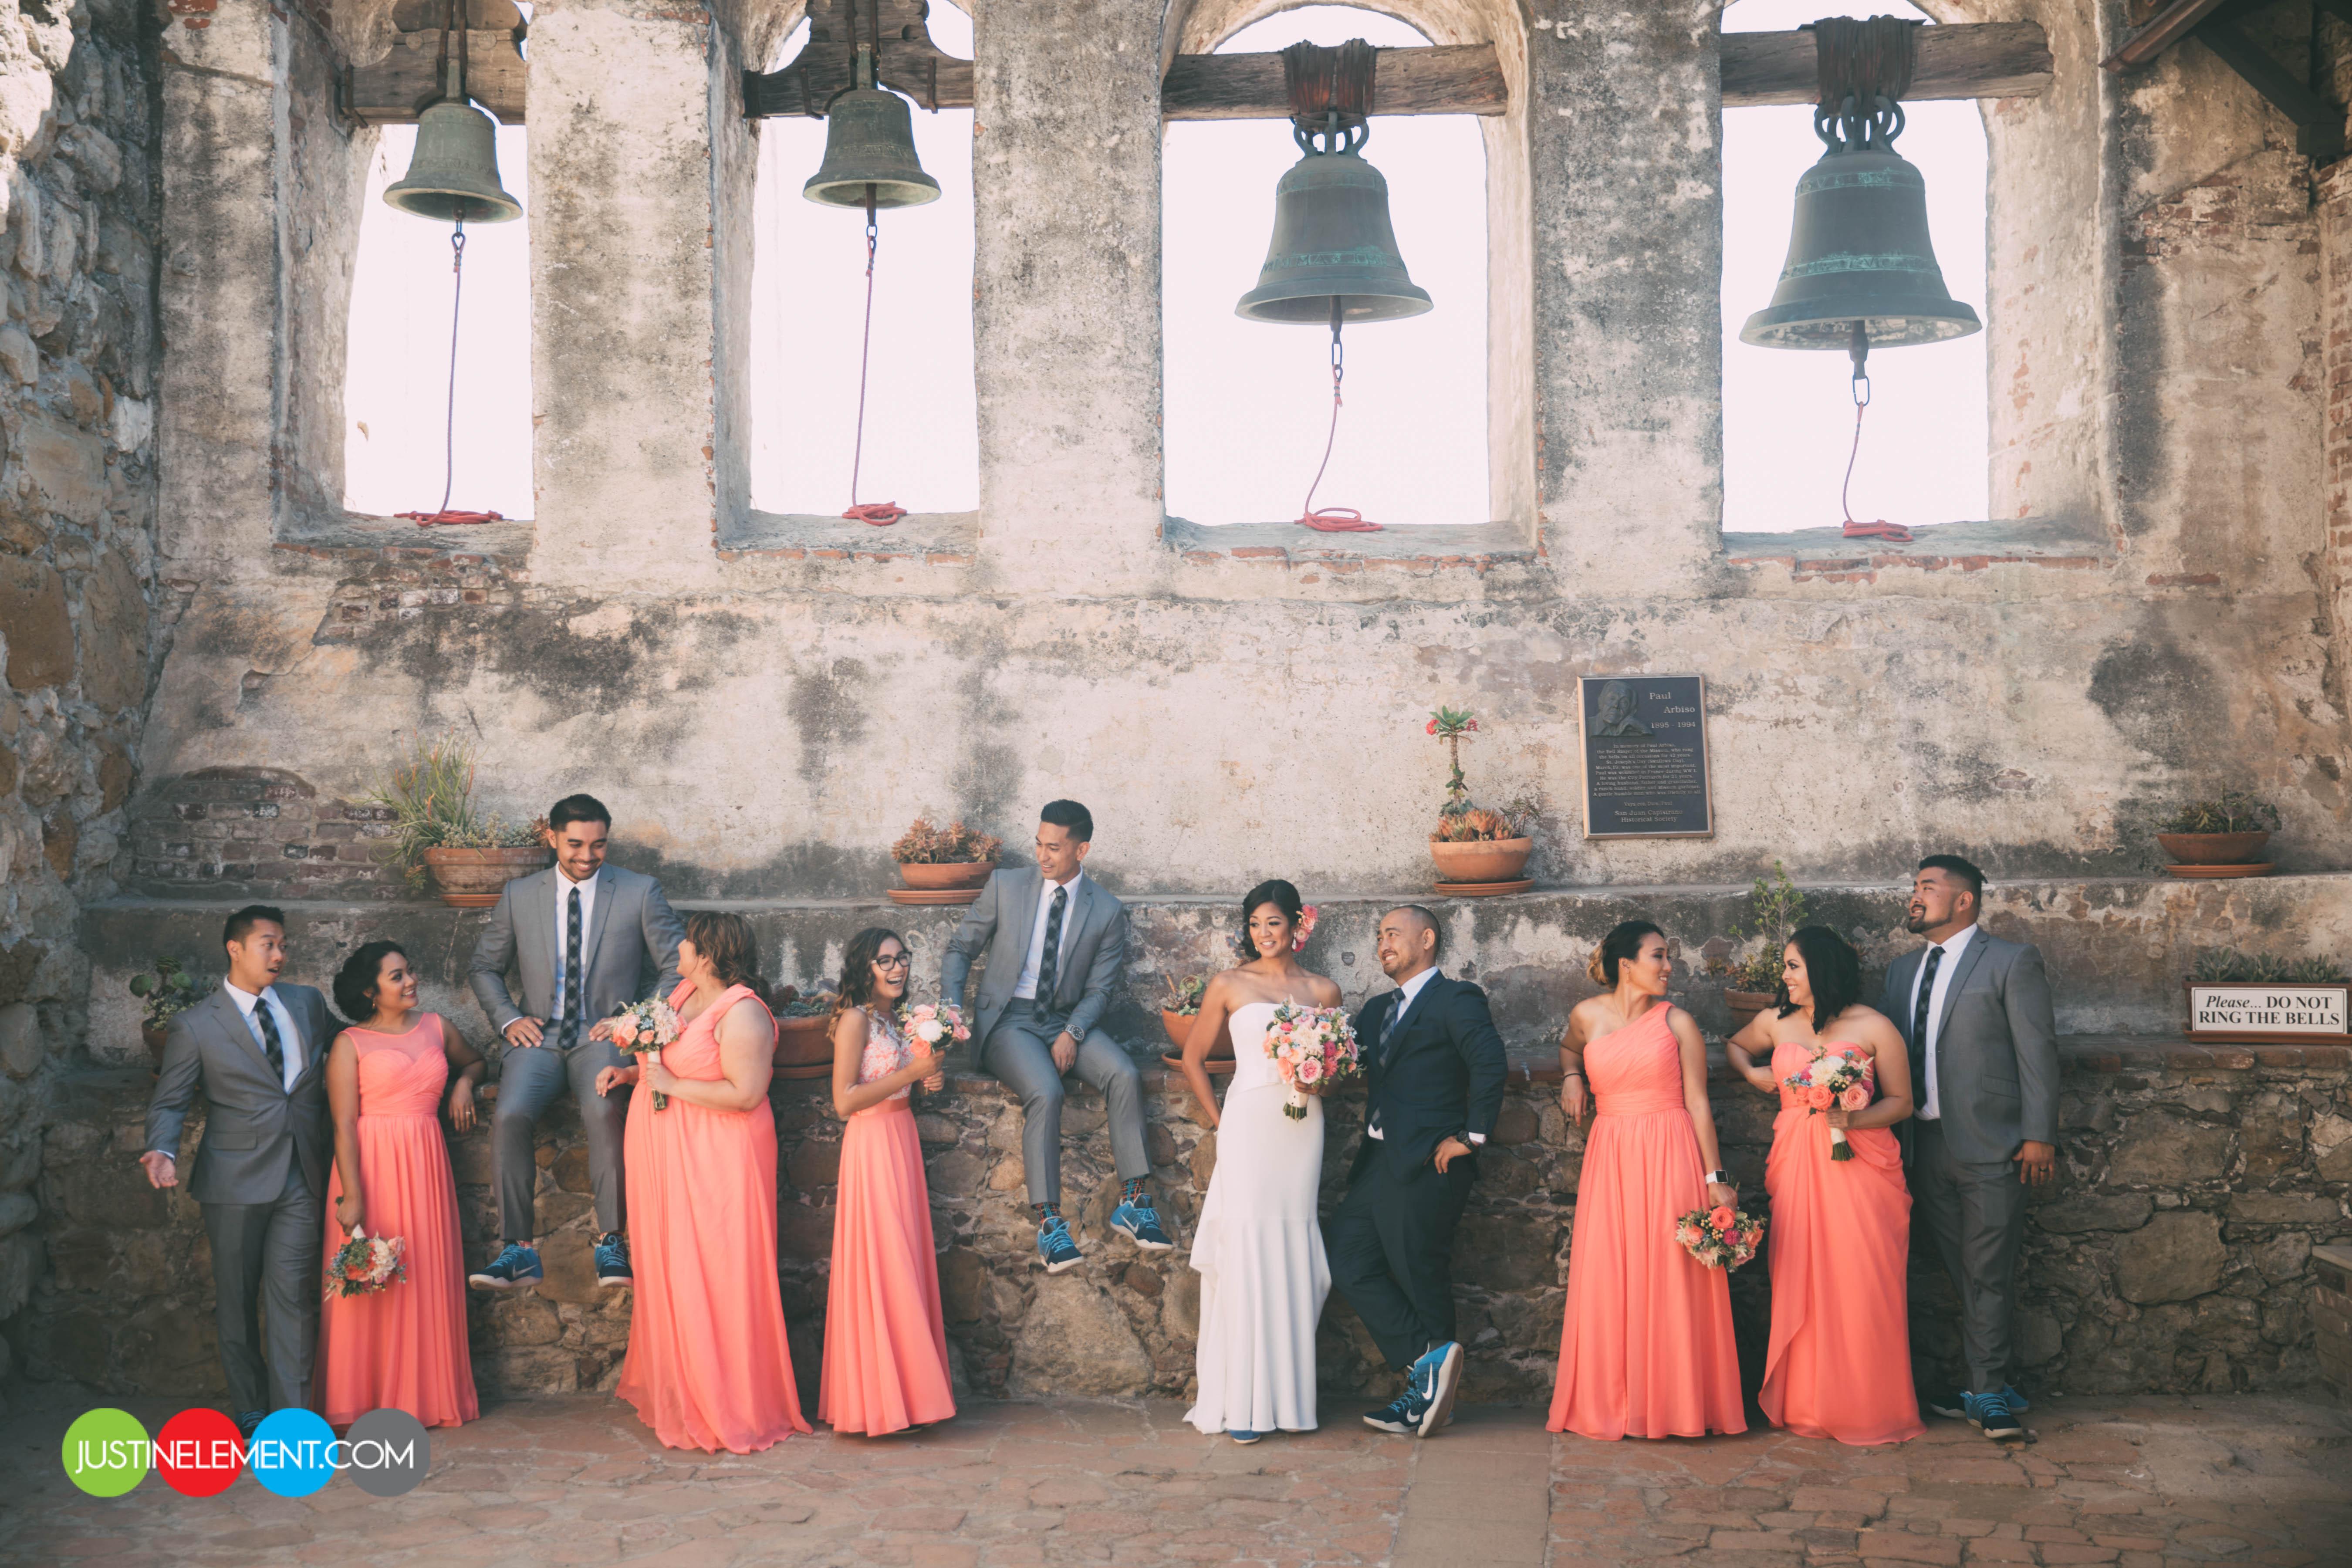 Kira Jeff Wedding Photo Teasers Franciscan Gardens San Juan Capistrano Justinelement